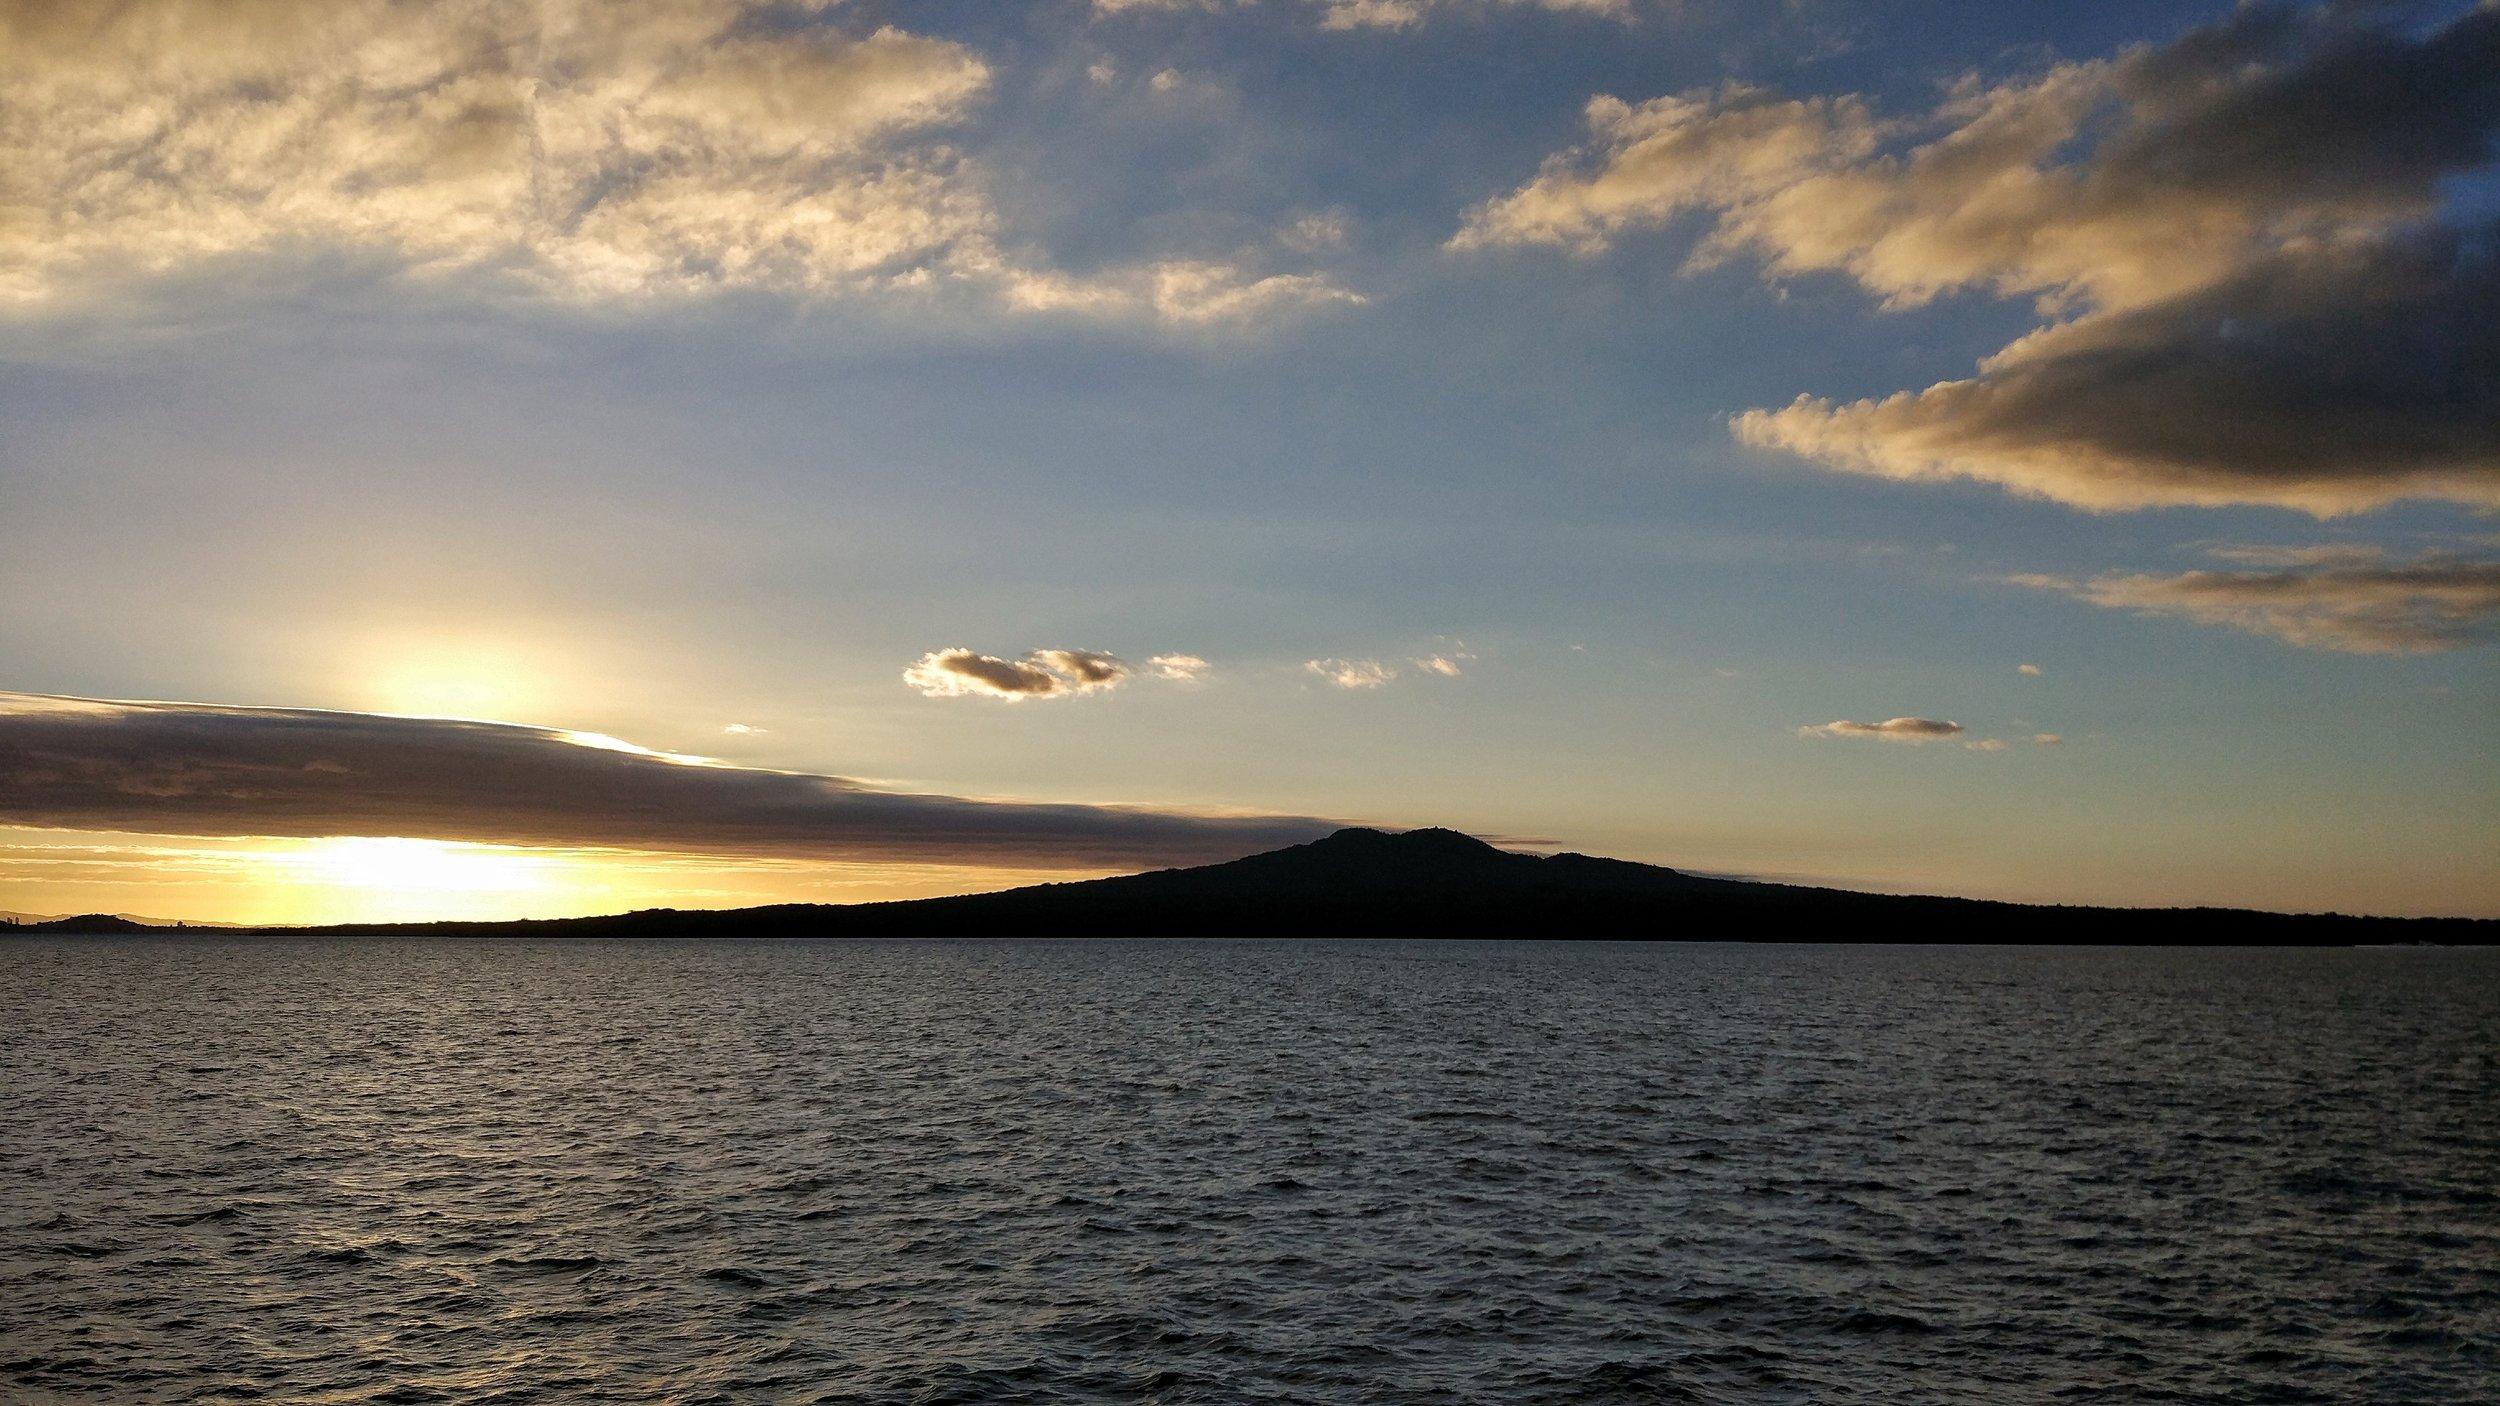 Rangitoto Island looking pretty at sunset